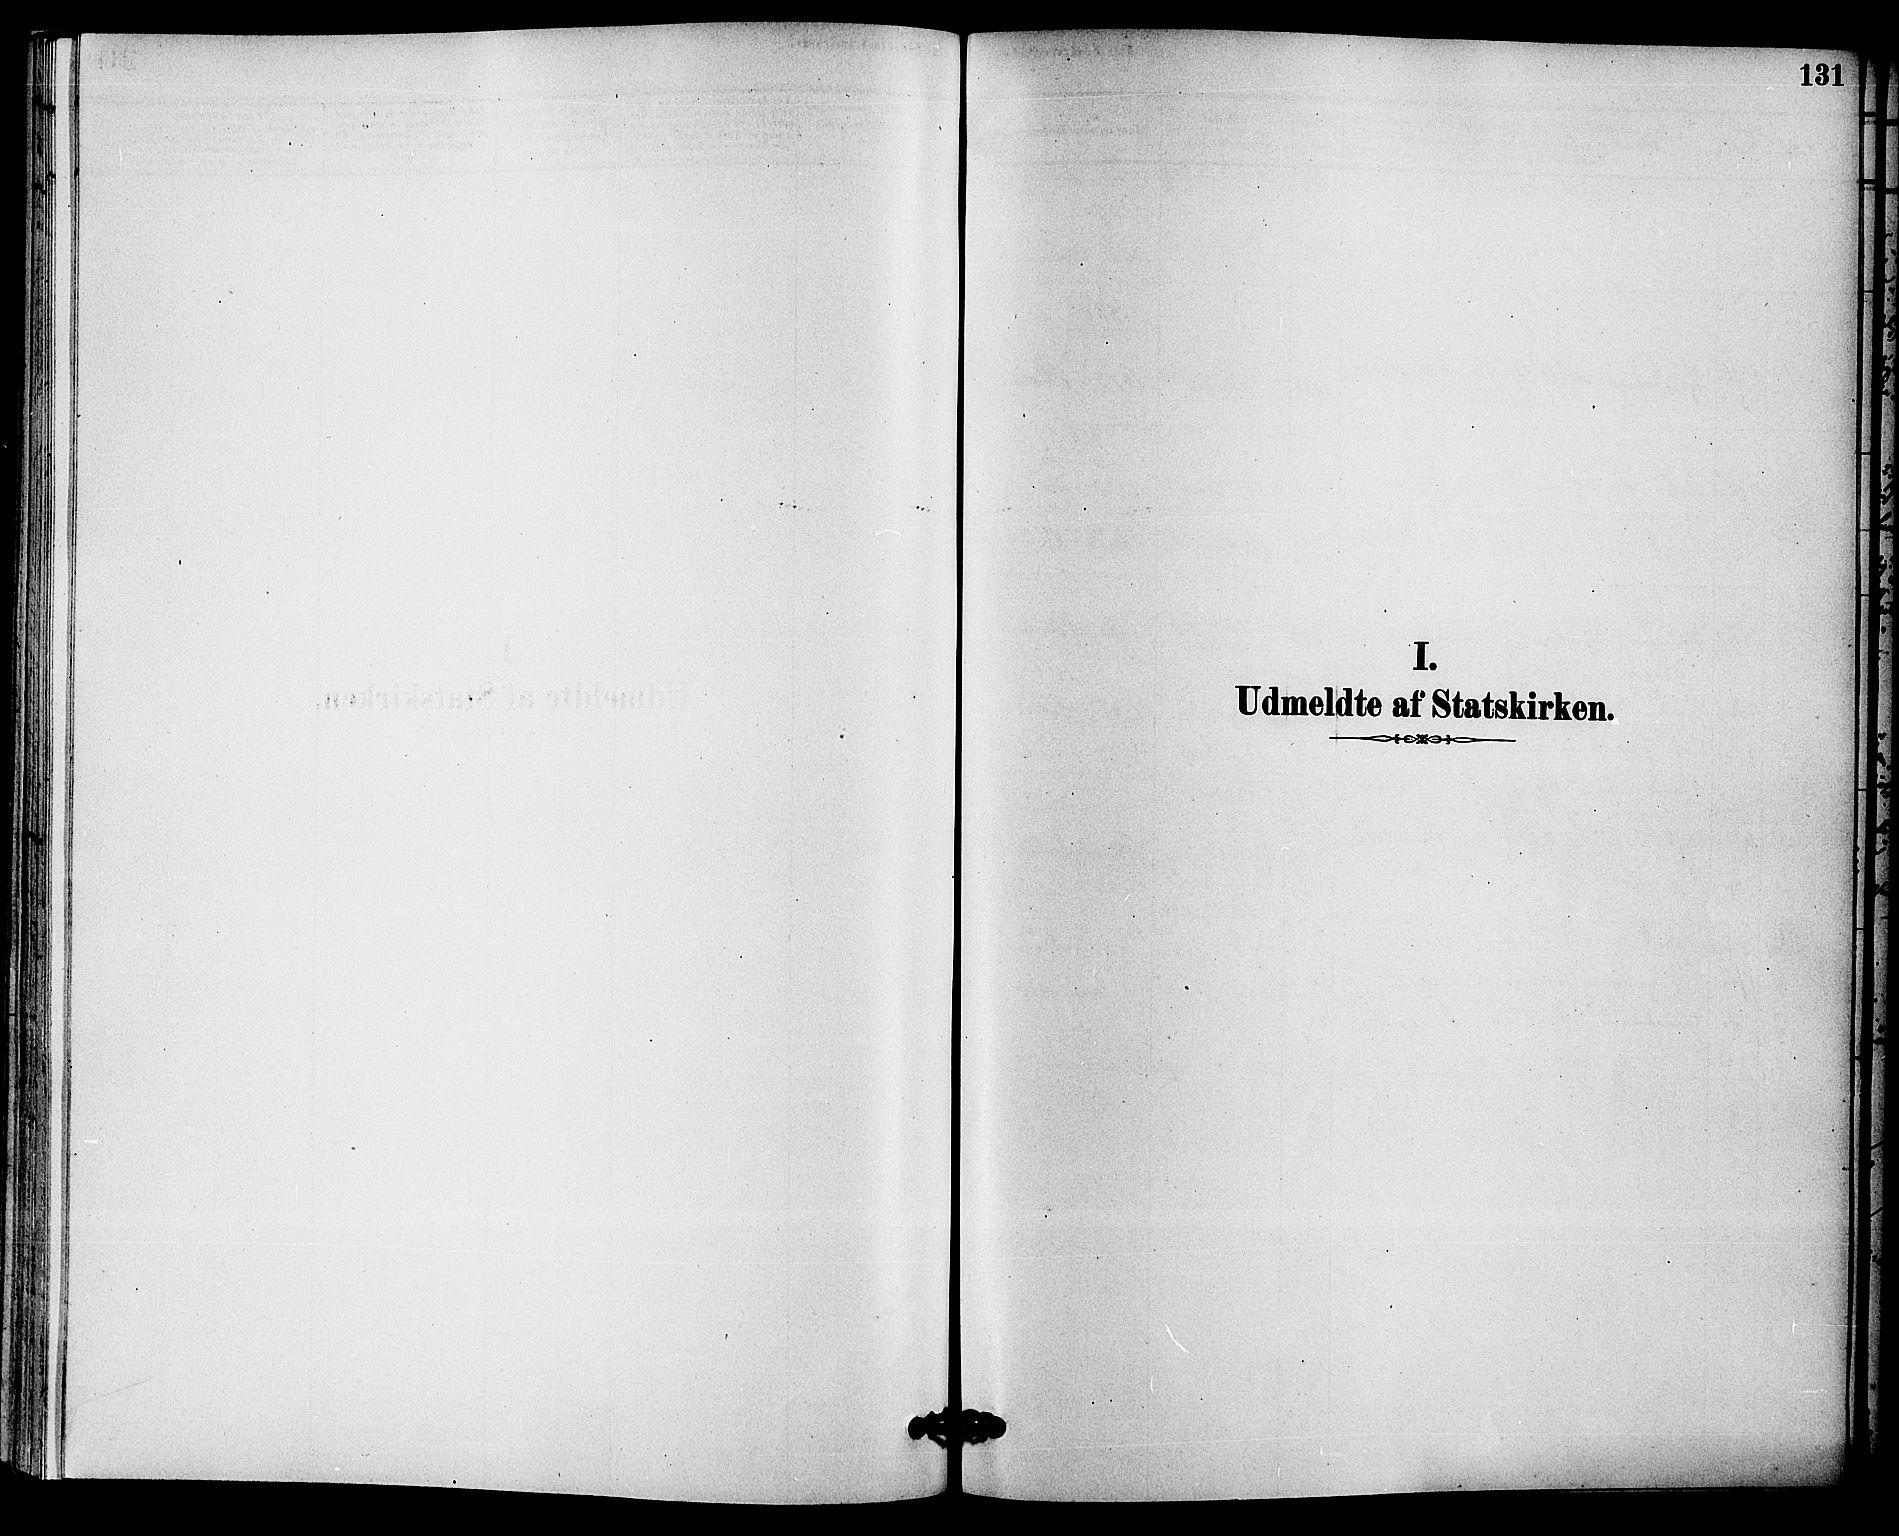 SAKO, Solum kirkebøker, F/Fc/L0001: Ministerialbok nr. III 1, 1877-1891, s. 131